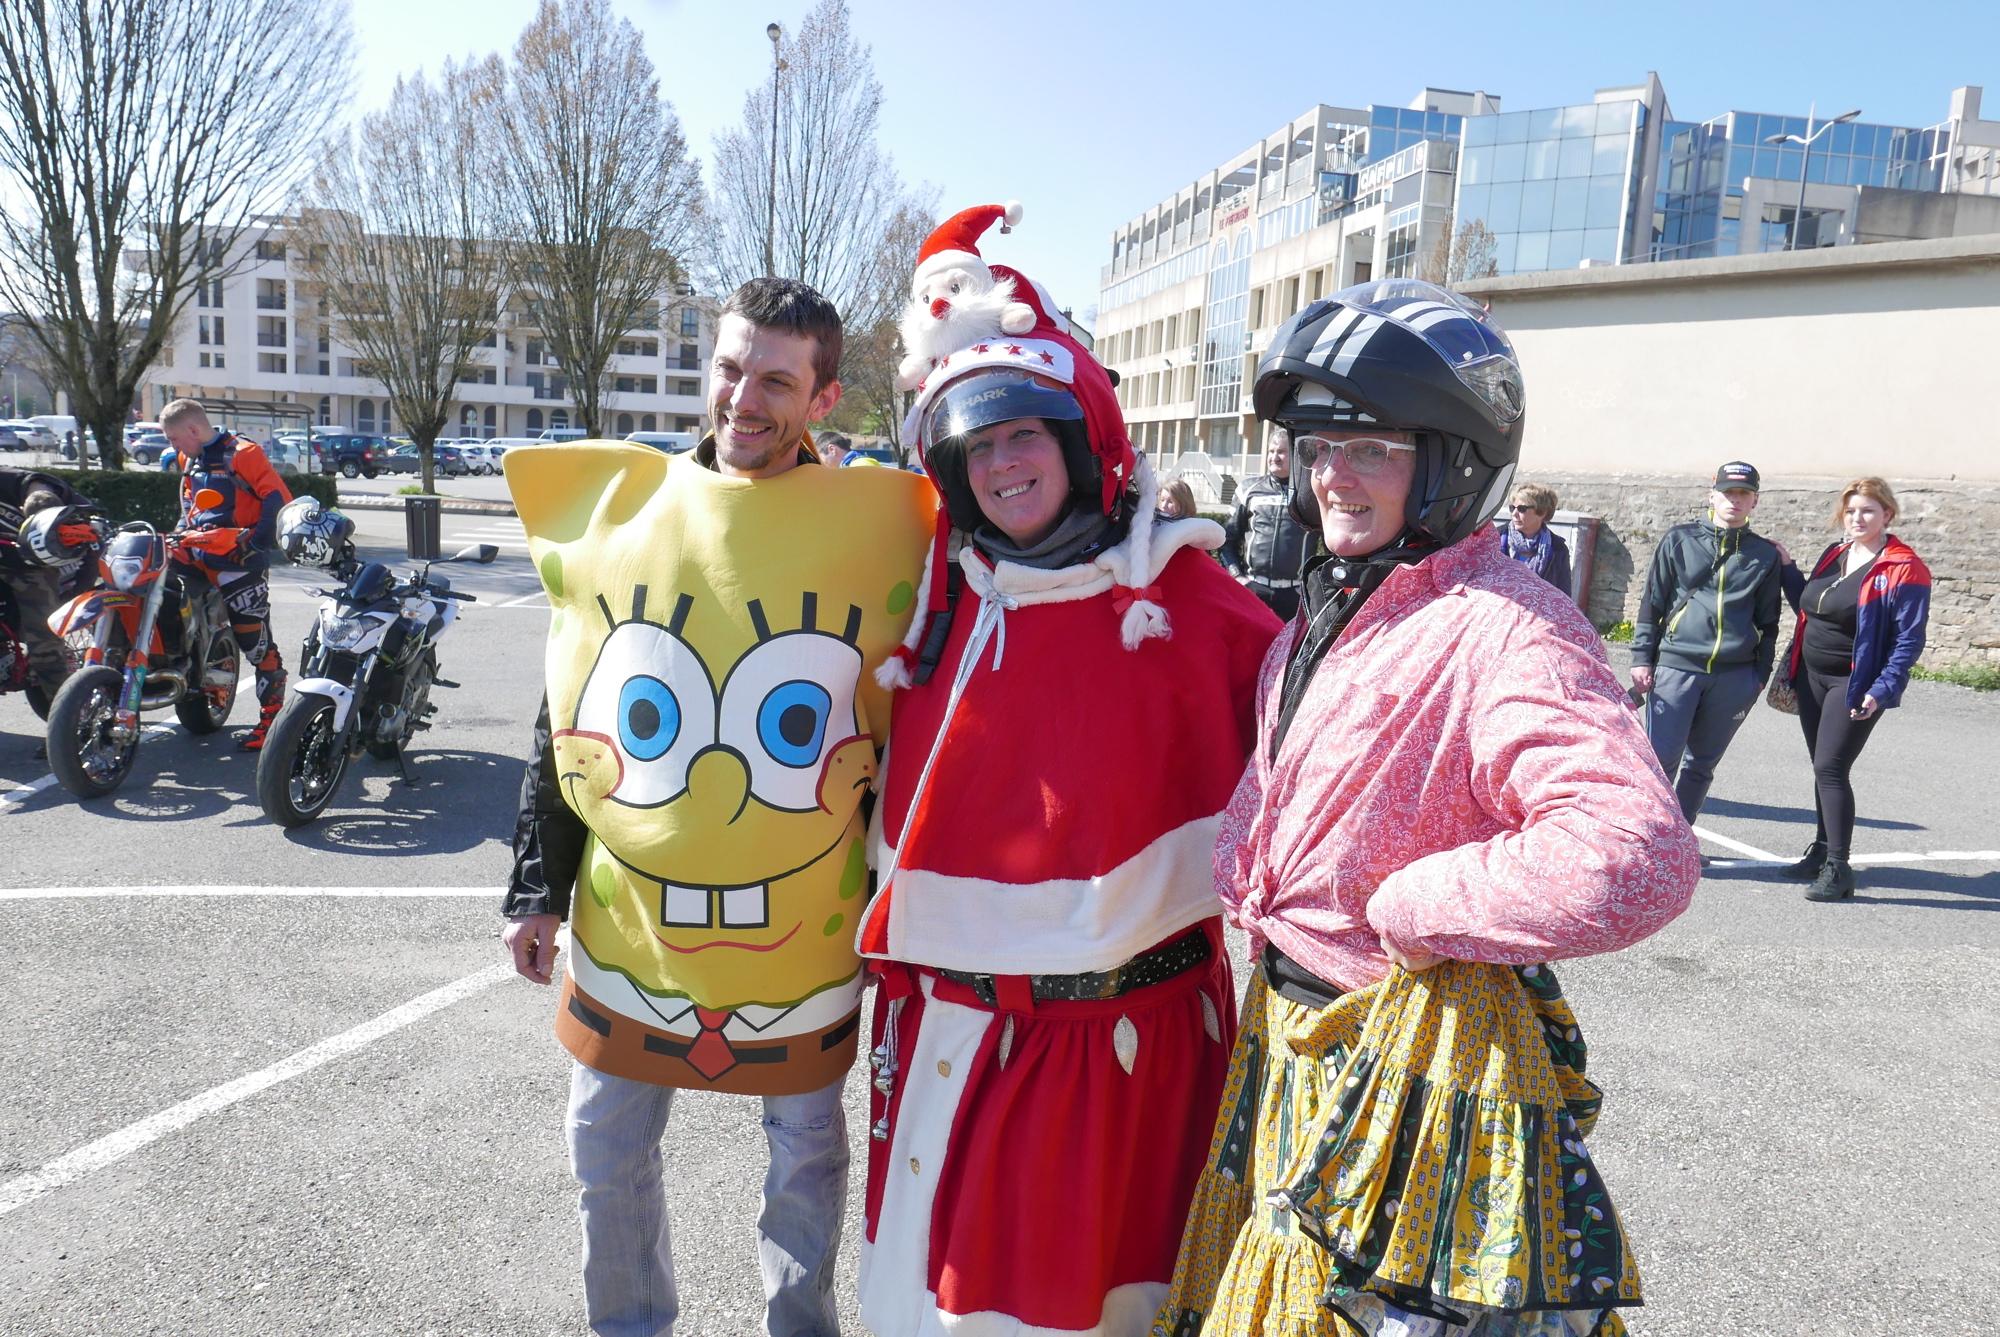 Carnaval des motards, samedi 23 mars : une belle balade et du soleil au programme